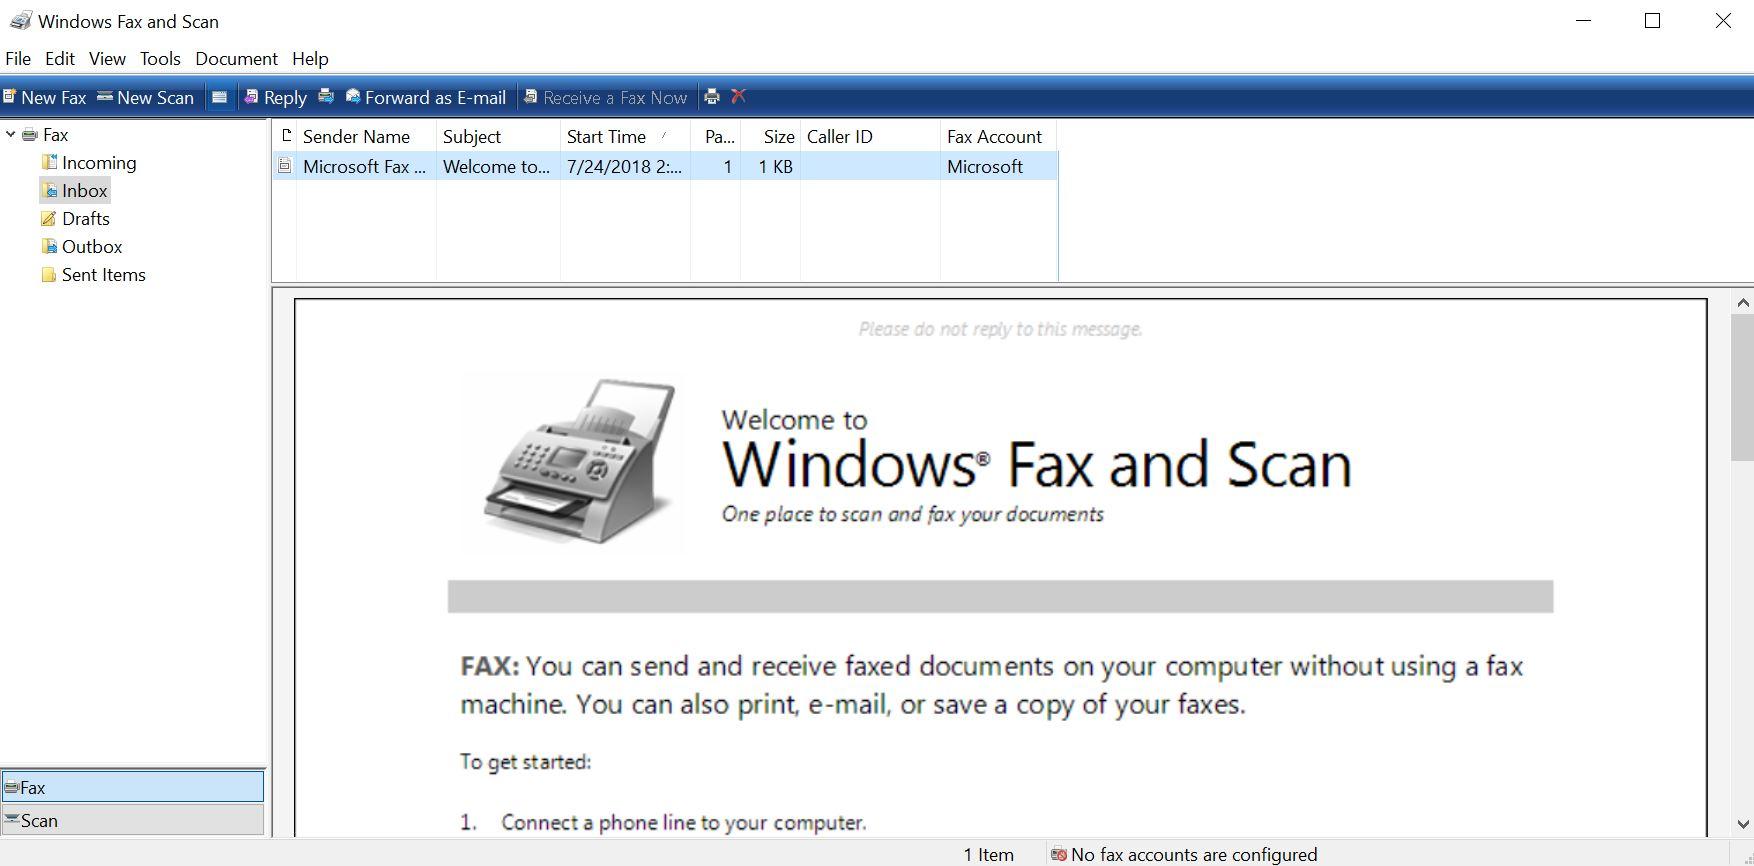 Top 5 Free Scanner Software For Windows 10 7 8 1 Scanning Apps For Pc Desktop Laptop Techapple